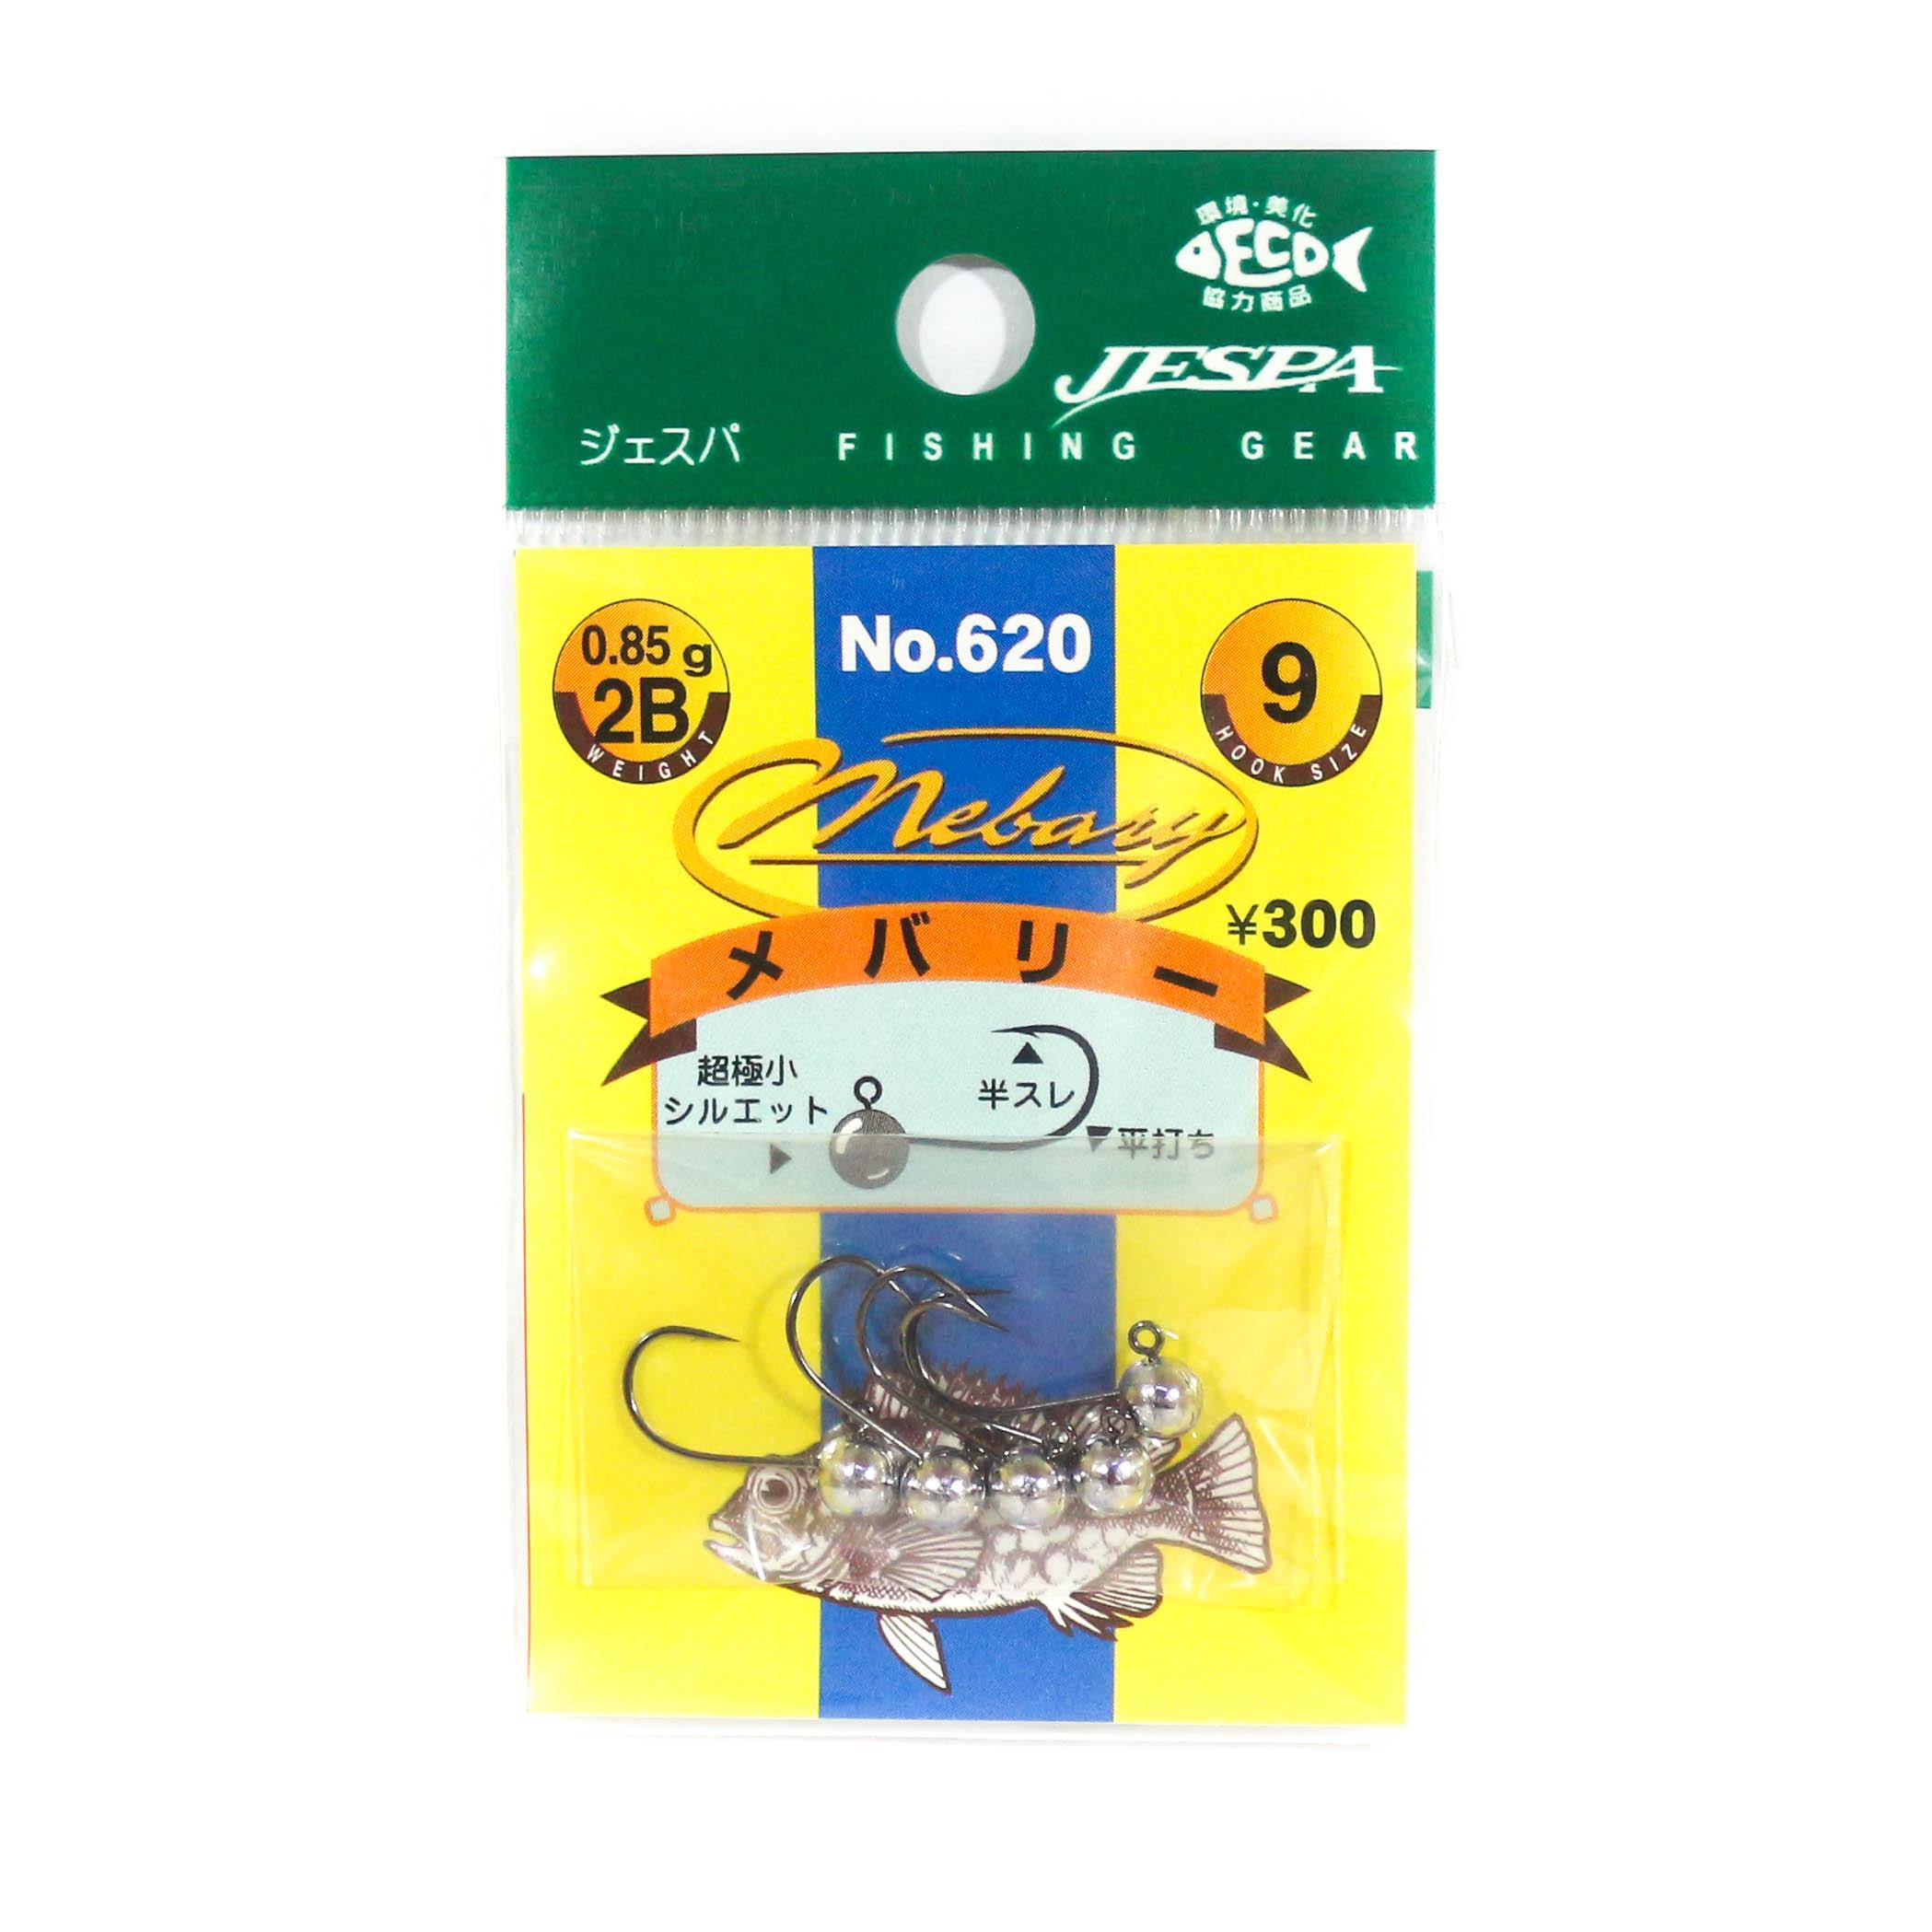 Yarie Jespa M. 620 Mini Mini Jig head Mebaru 5 piece per pack 0.85 gram (7162)